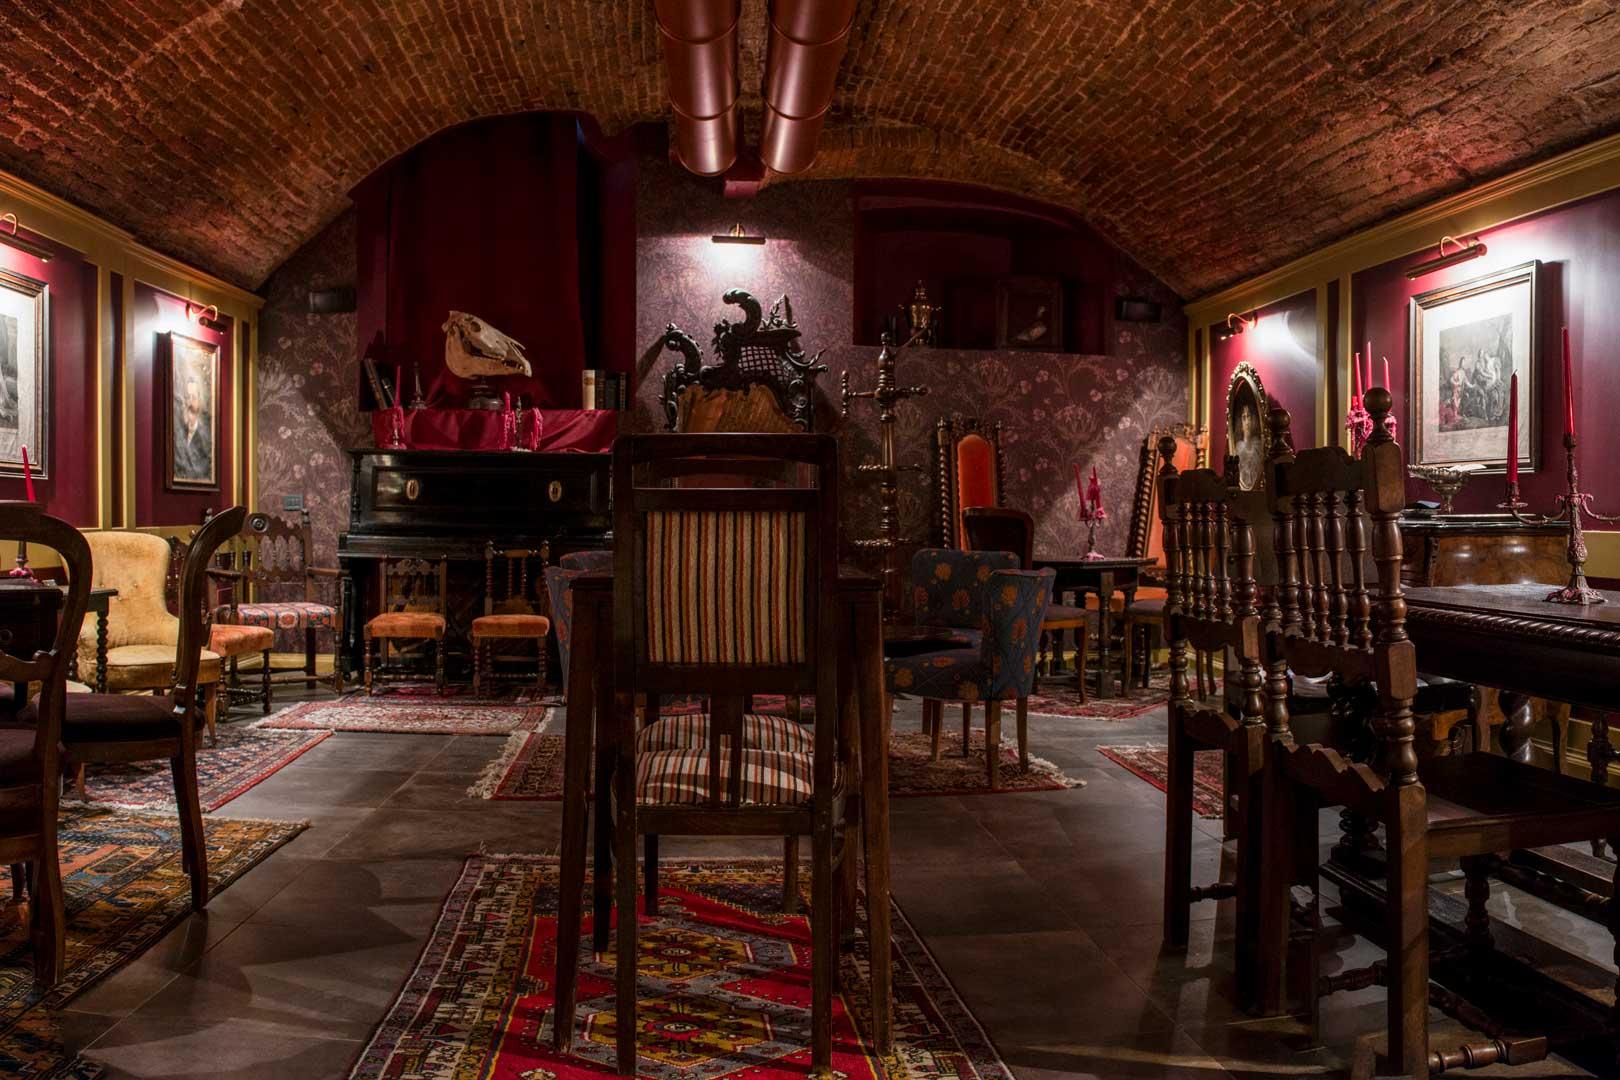 I 10 migliori cocktail bar d'Italia - Rasputin